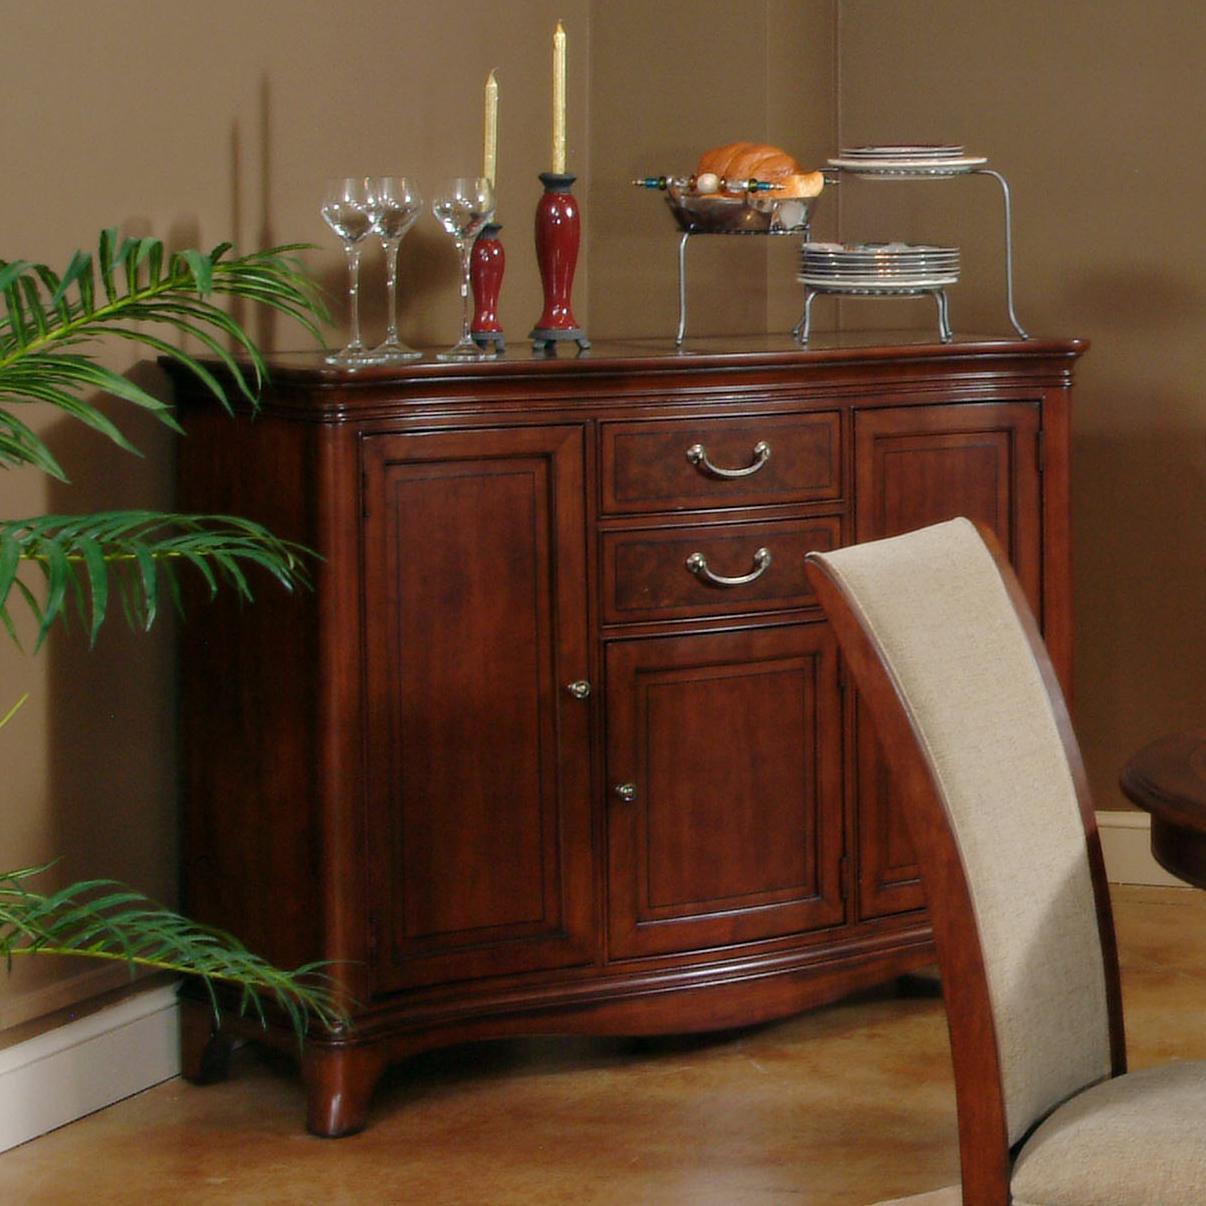 Morris Home Furnishings South Hampton South Hampton Server - Item Number: 837-320